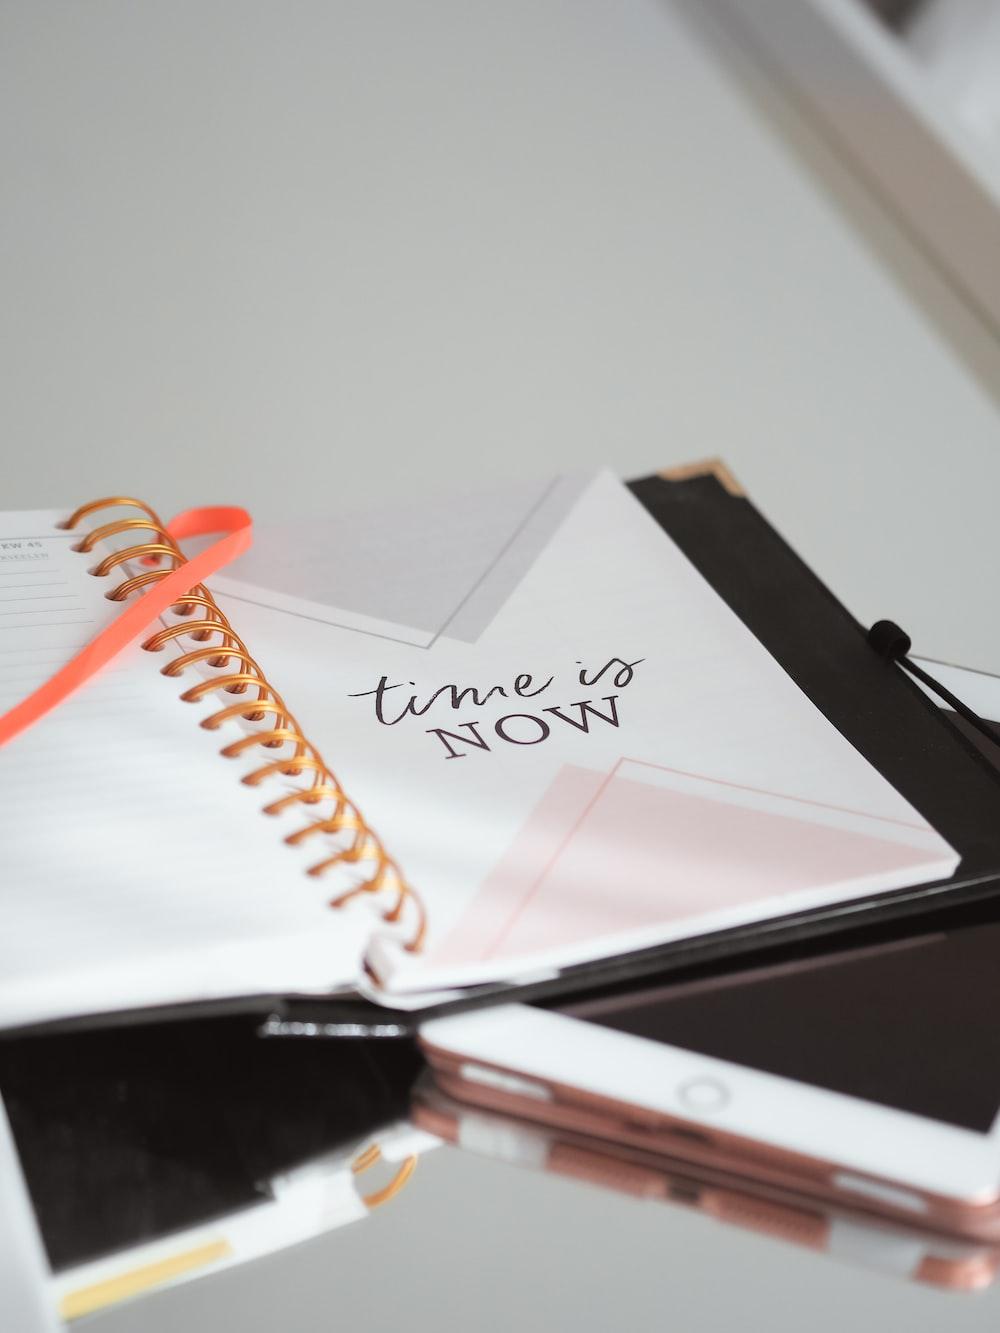 white ipad on white notebook